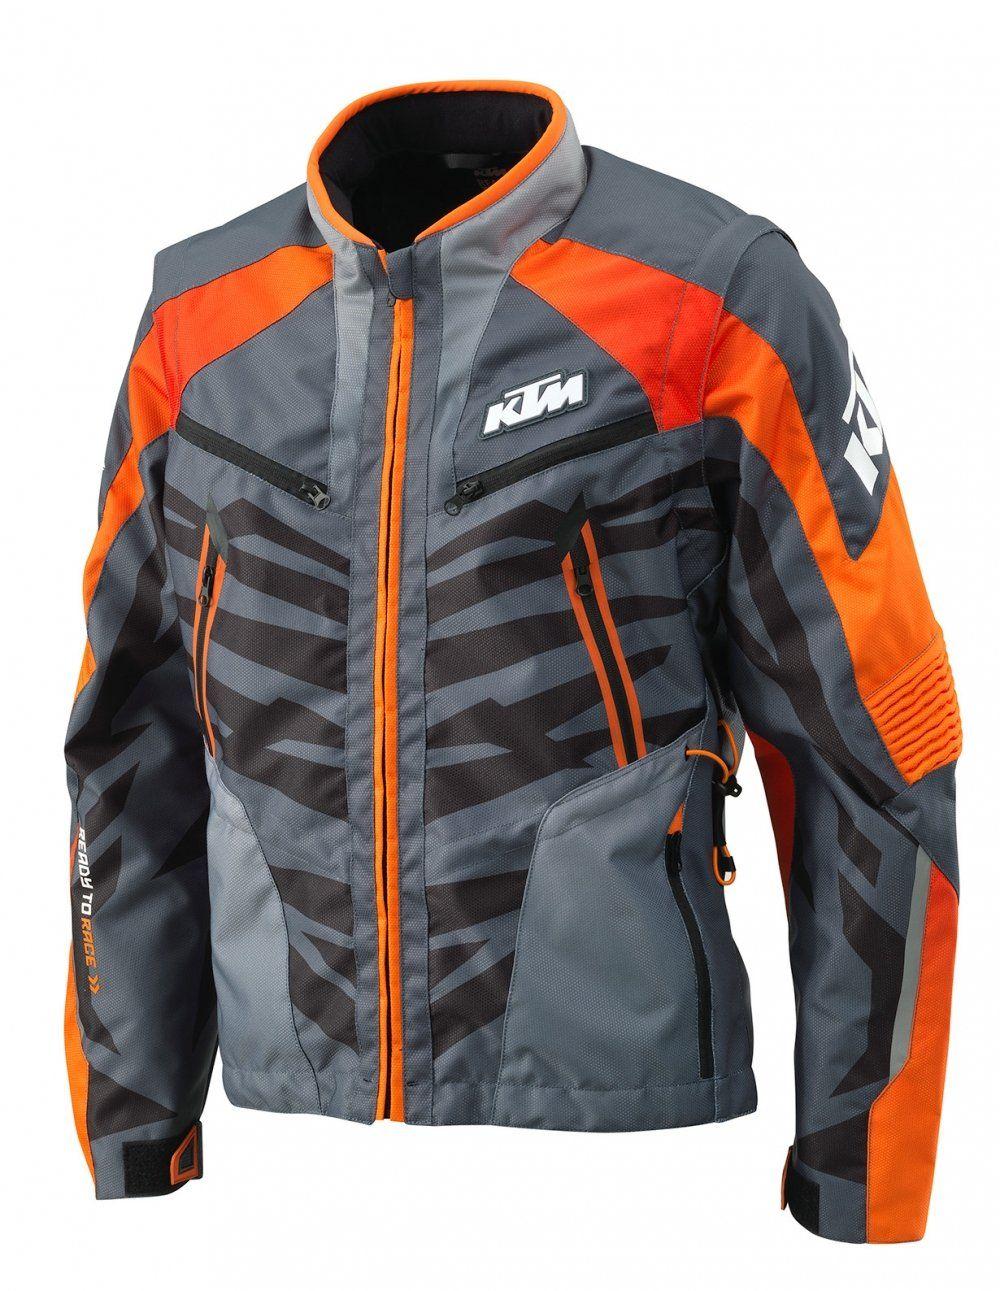 635d1d1acb KTM Racing Jacket   Products   Riding jacket, Motocross, Motorbike ...